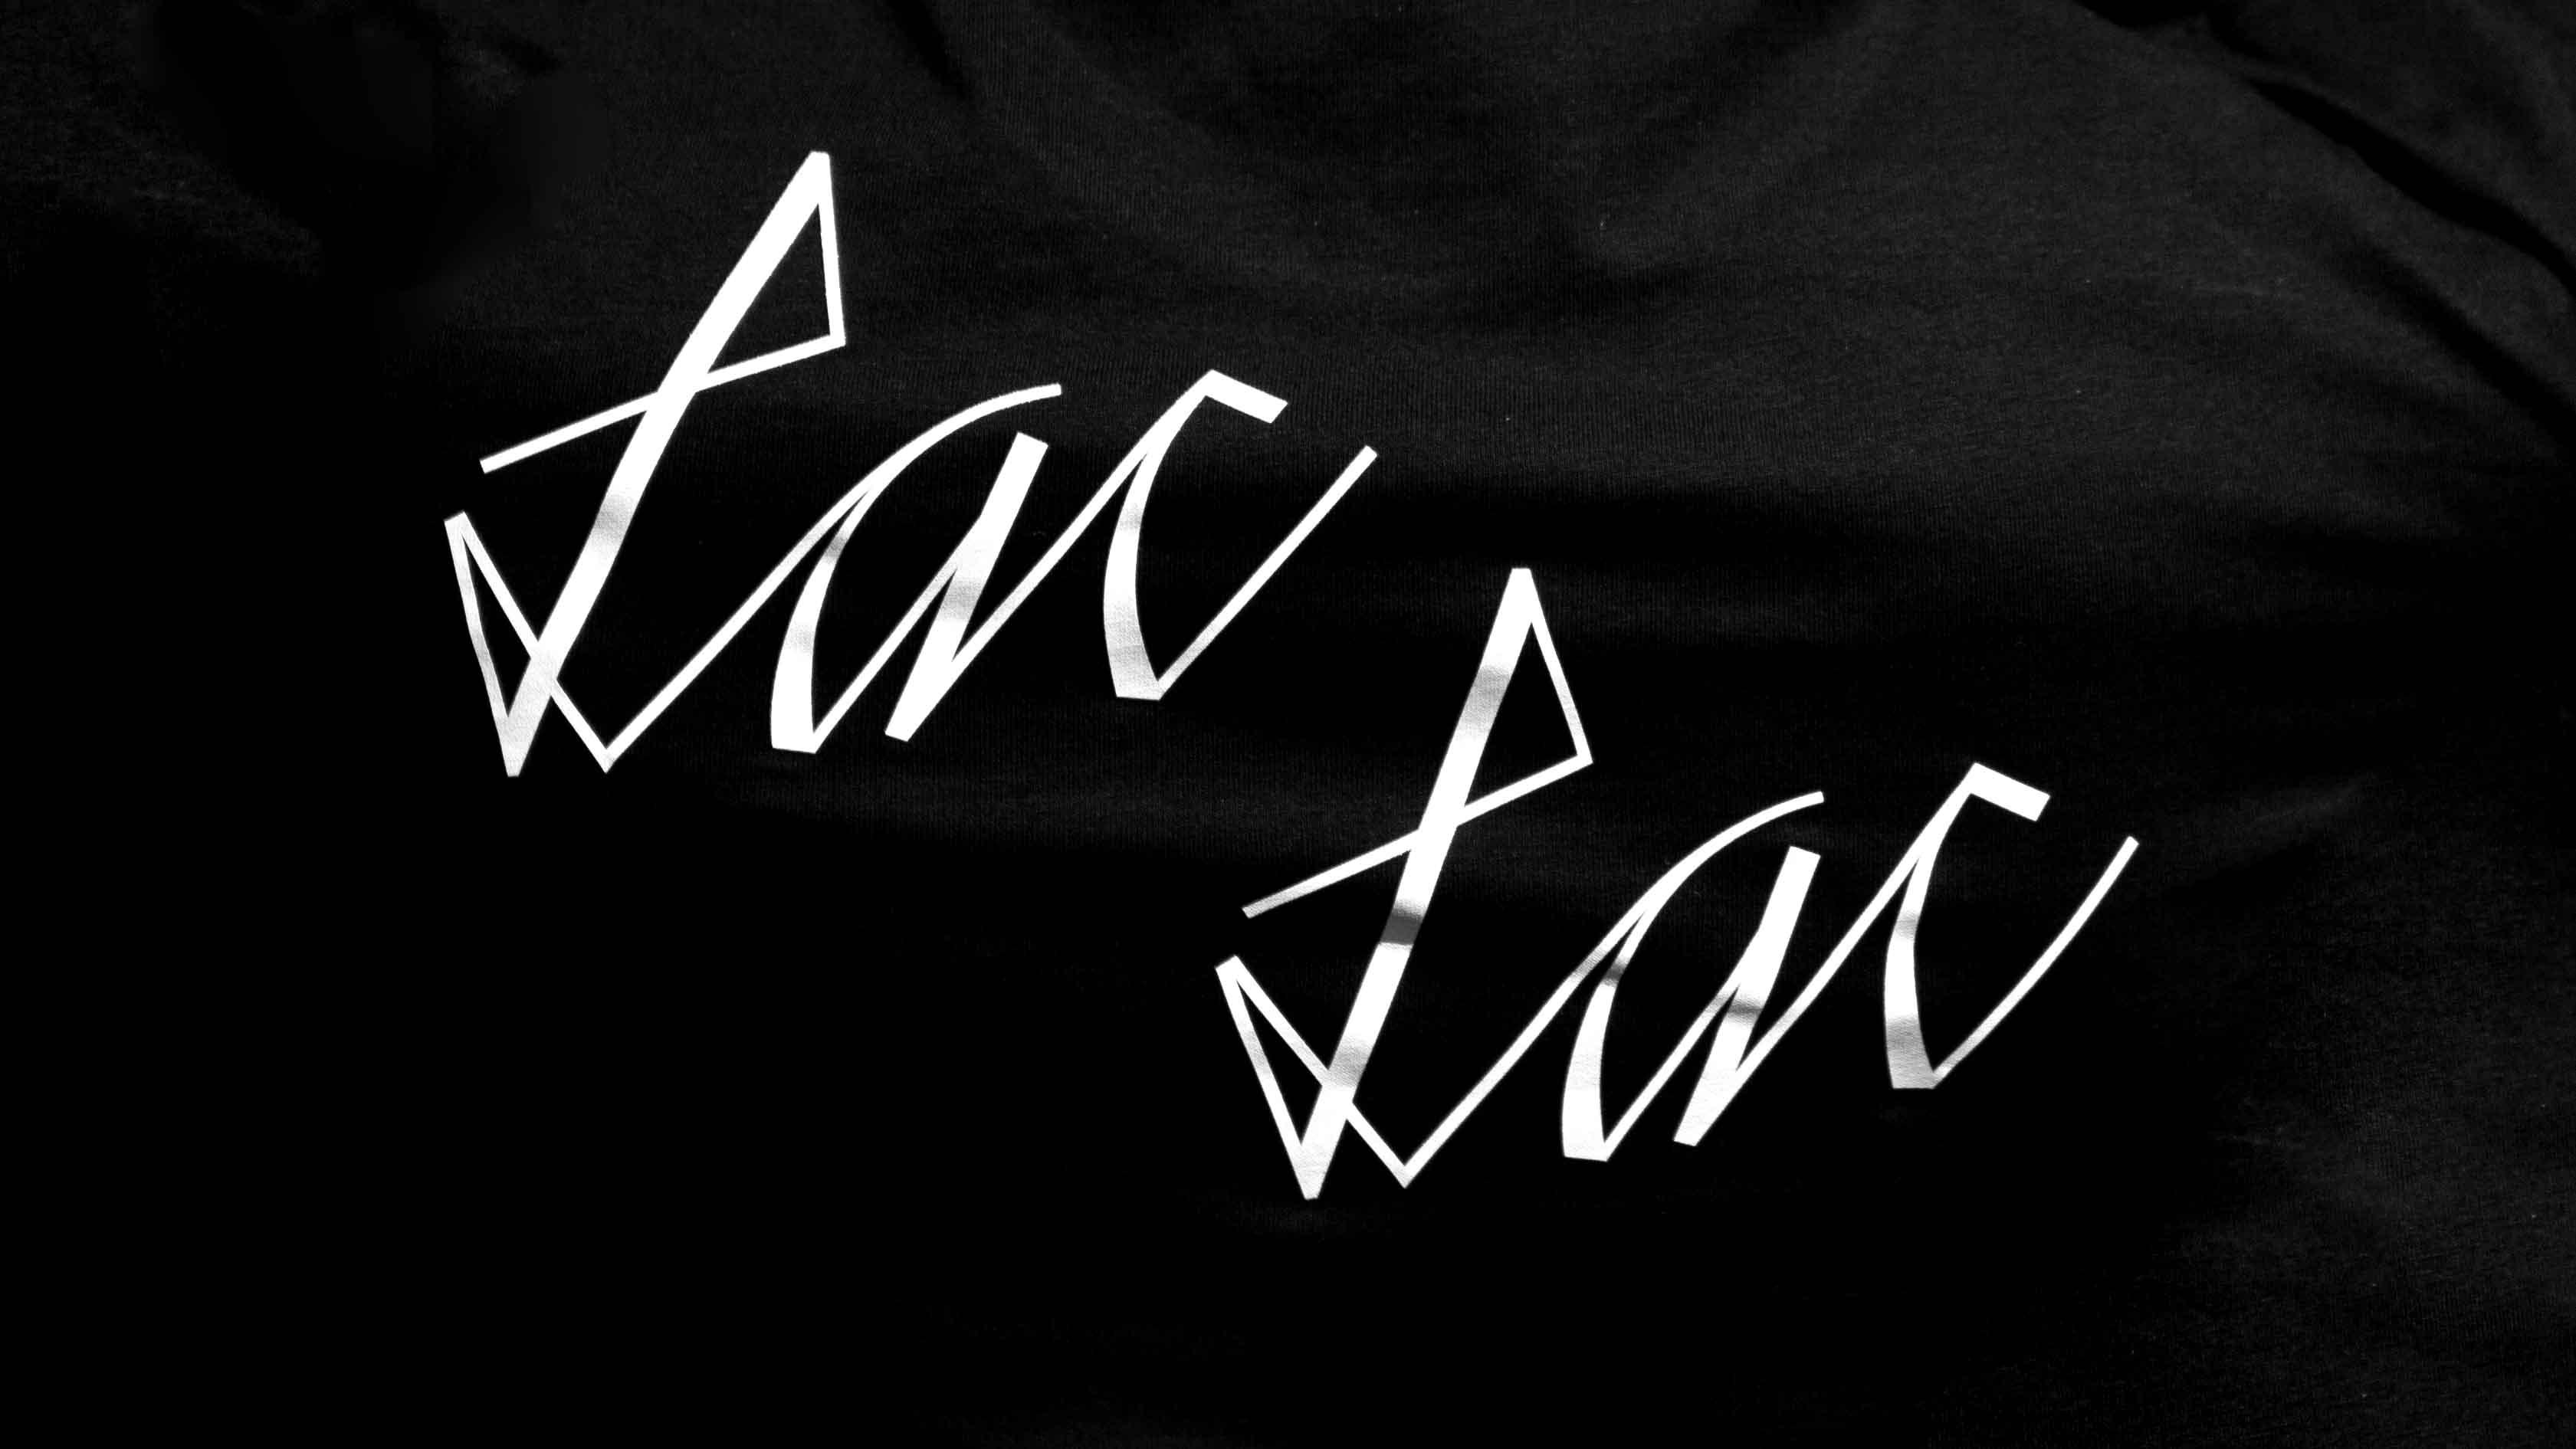 LacLac